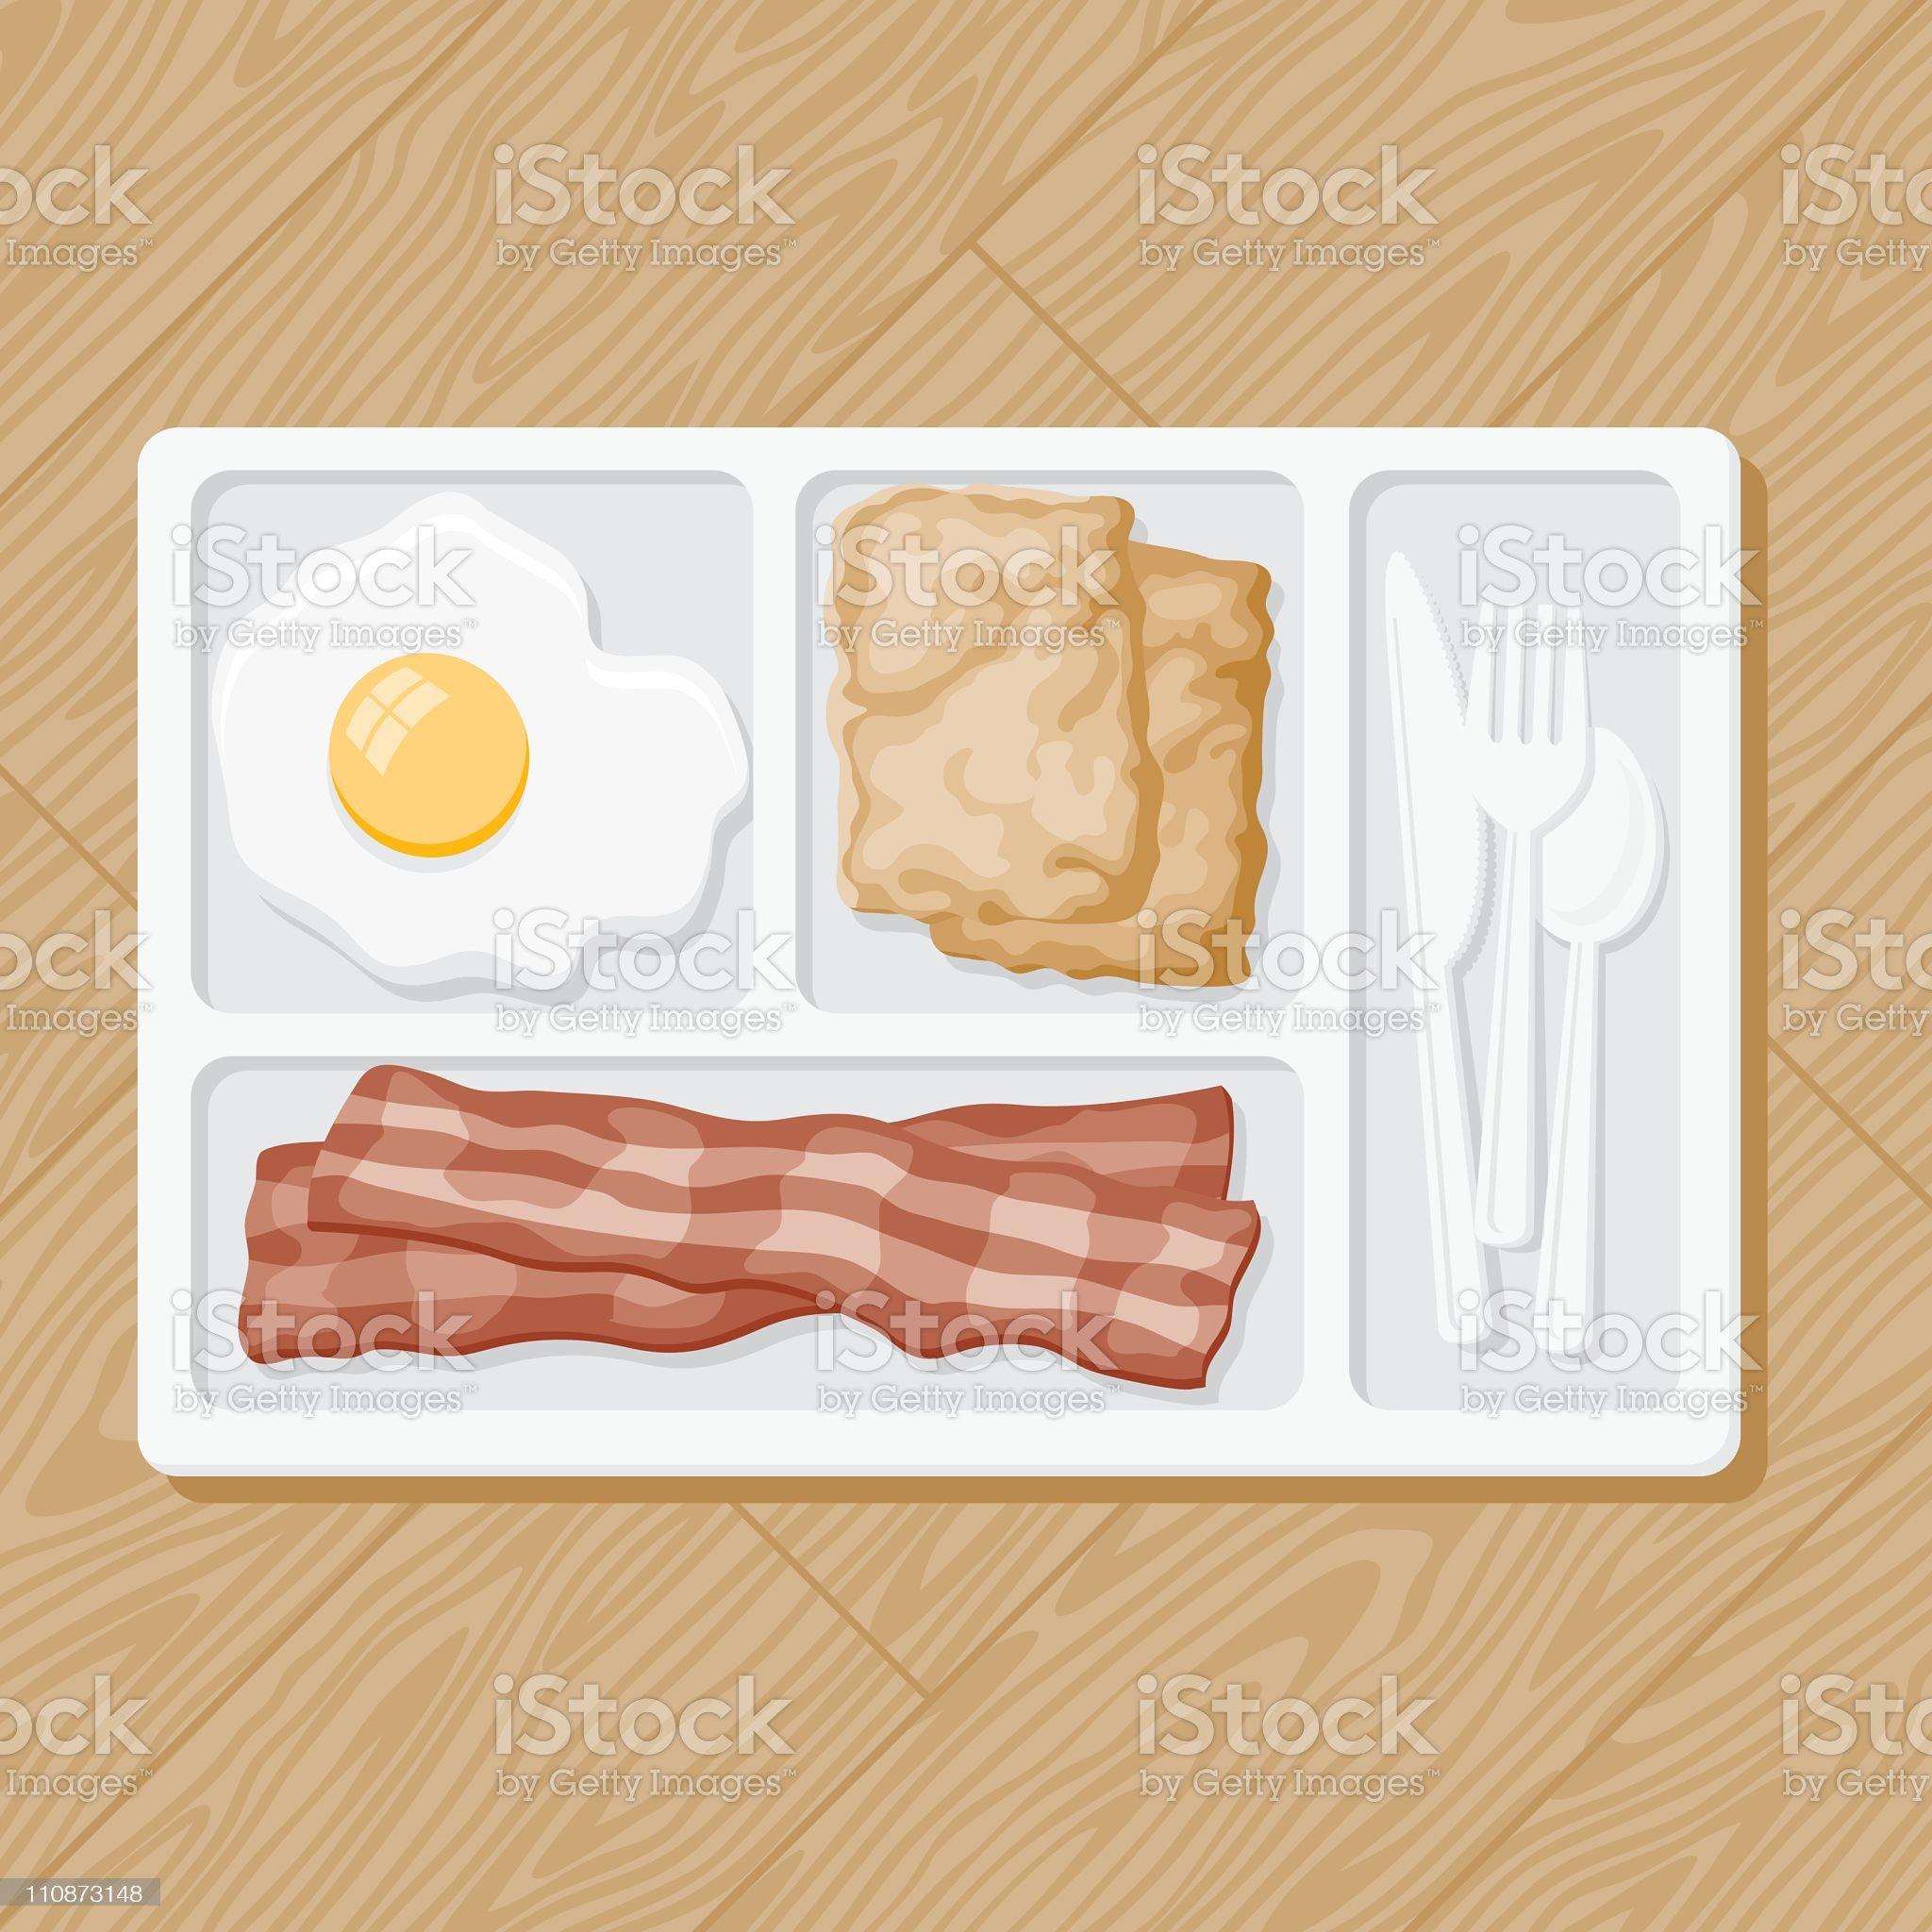 TV Breakfast royalty-free stock vector art